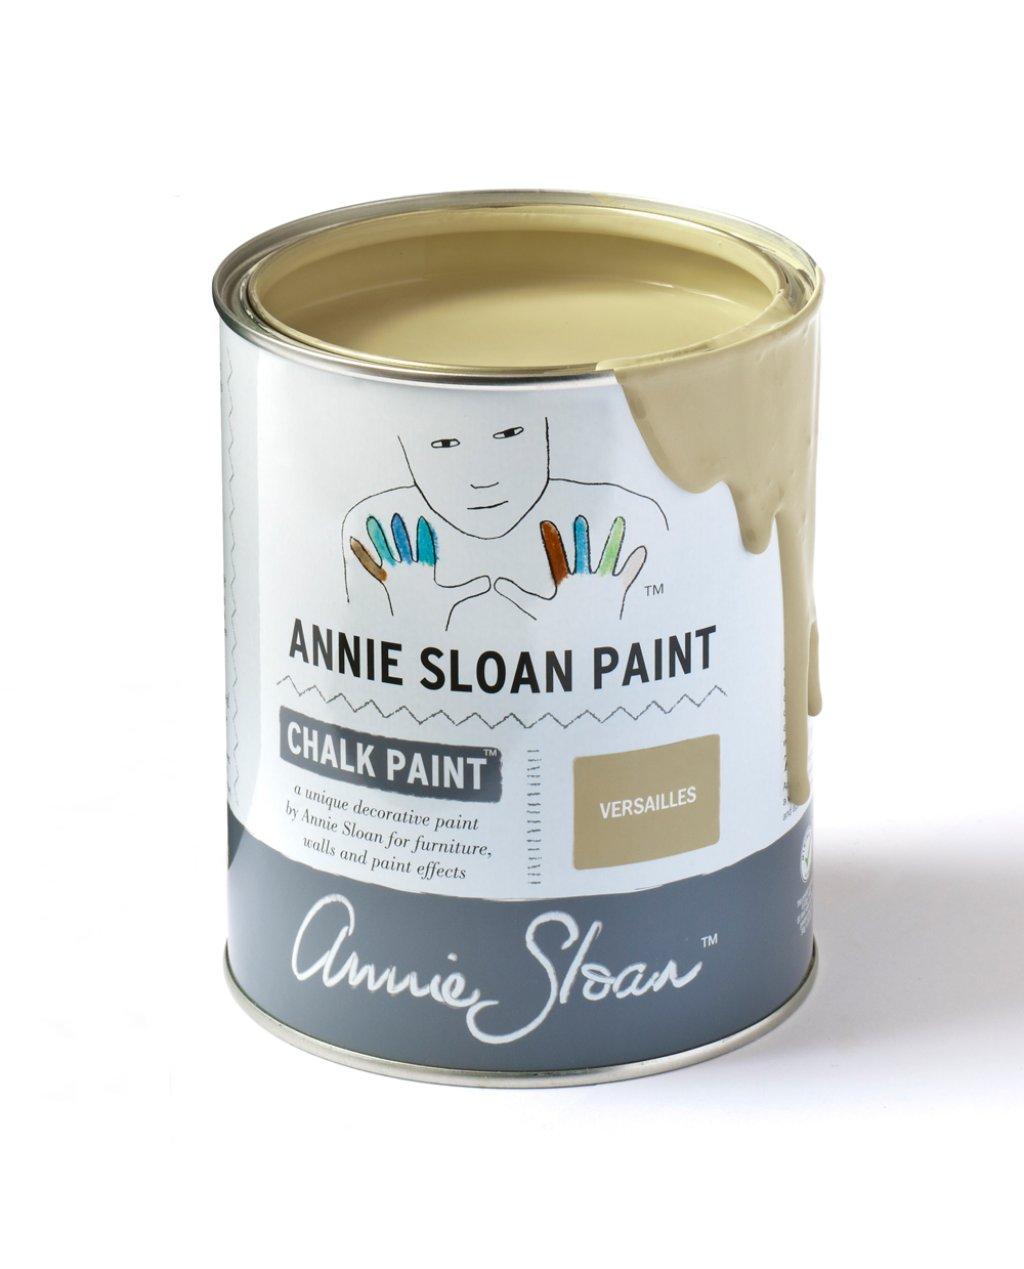 Annie Sloan Chalk Paint - Versailles